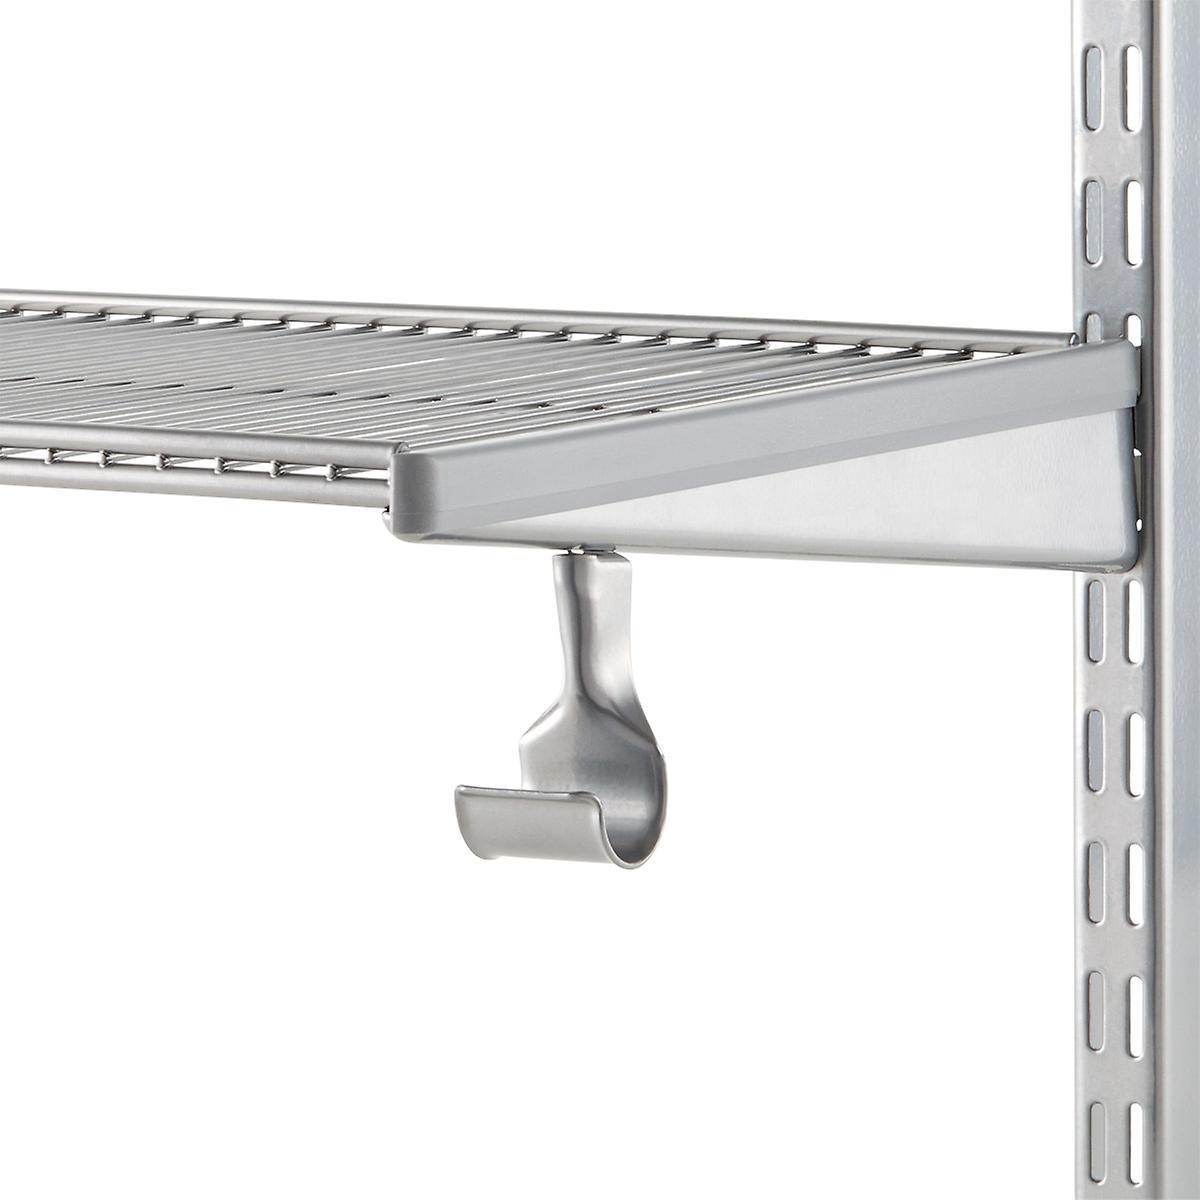 holder holders pins slp rod sets closet pole com amazon